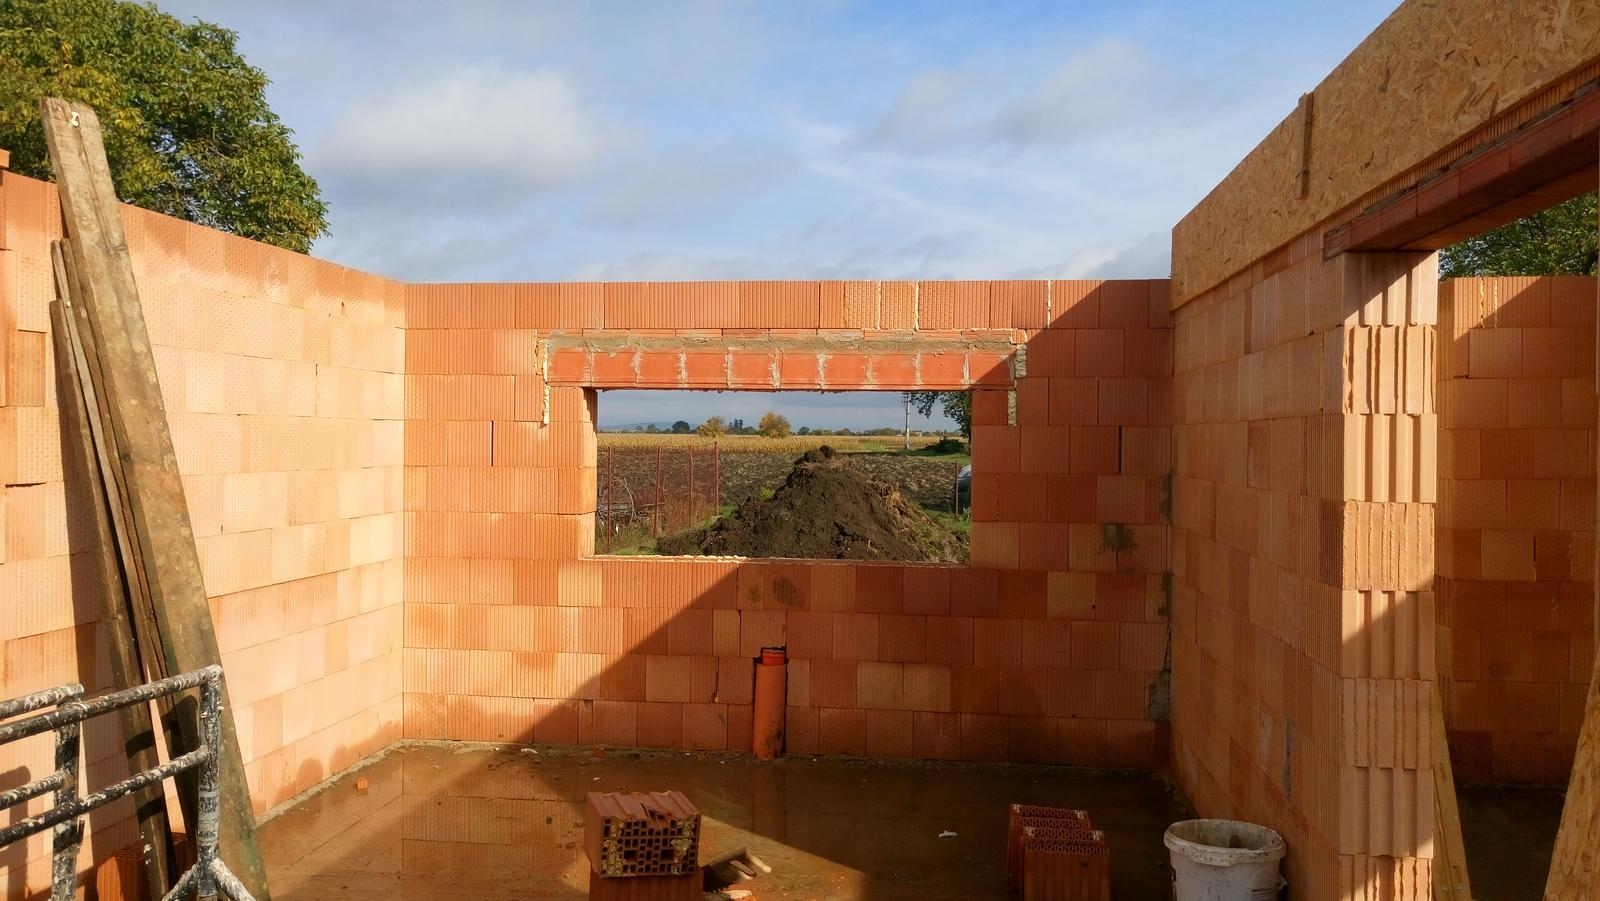 Pozemok + projekt + hruba stavba - okno prerobene